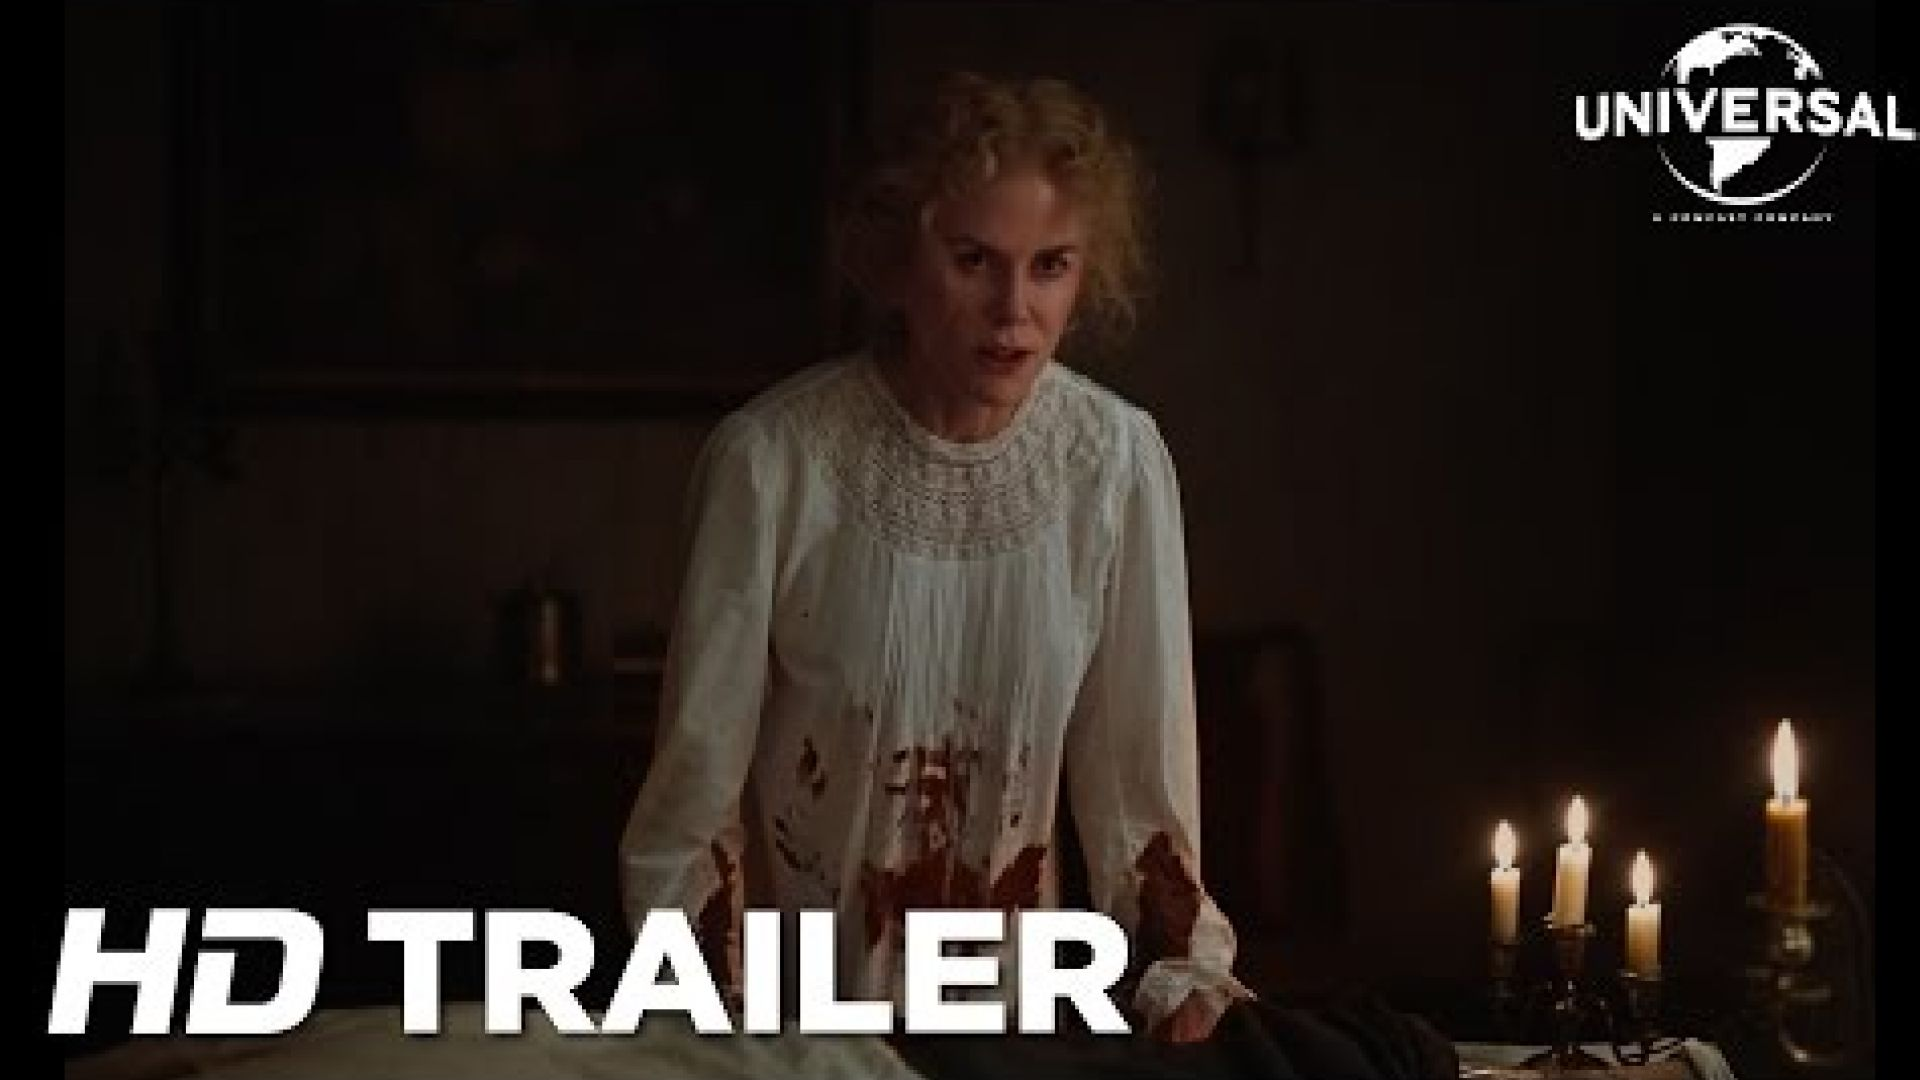 Tense trailer for Sofia Coppola's drama 'The Beguiled'. Star